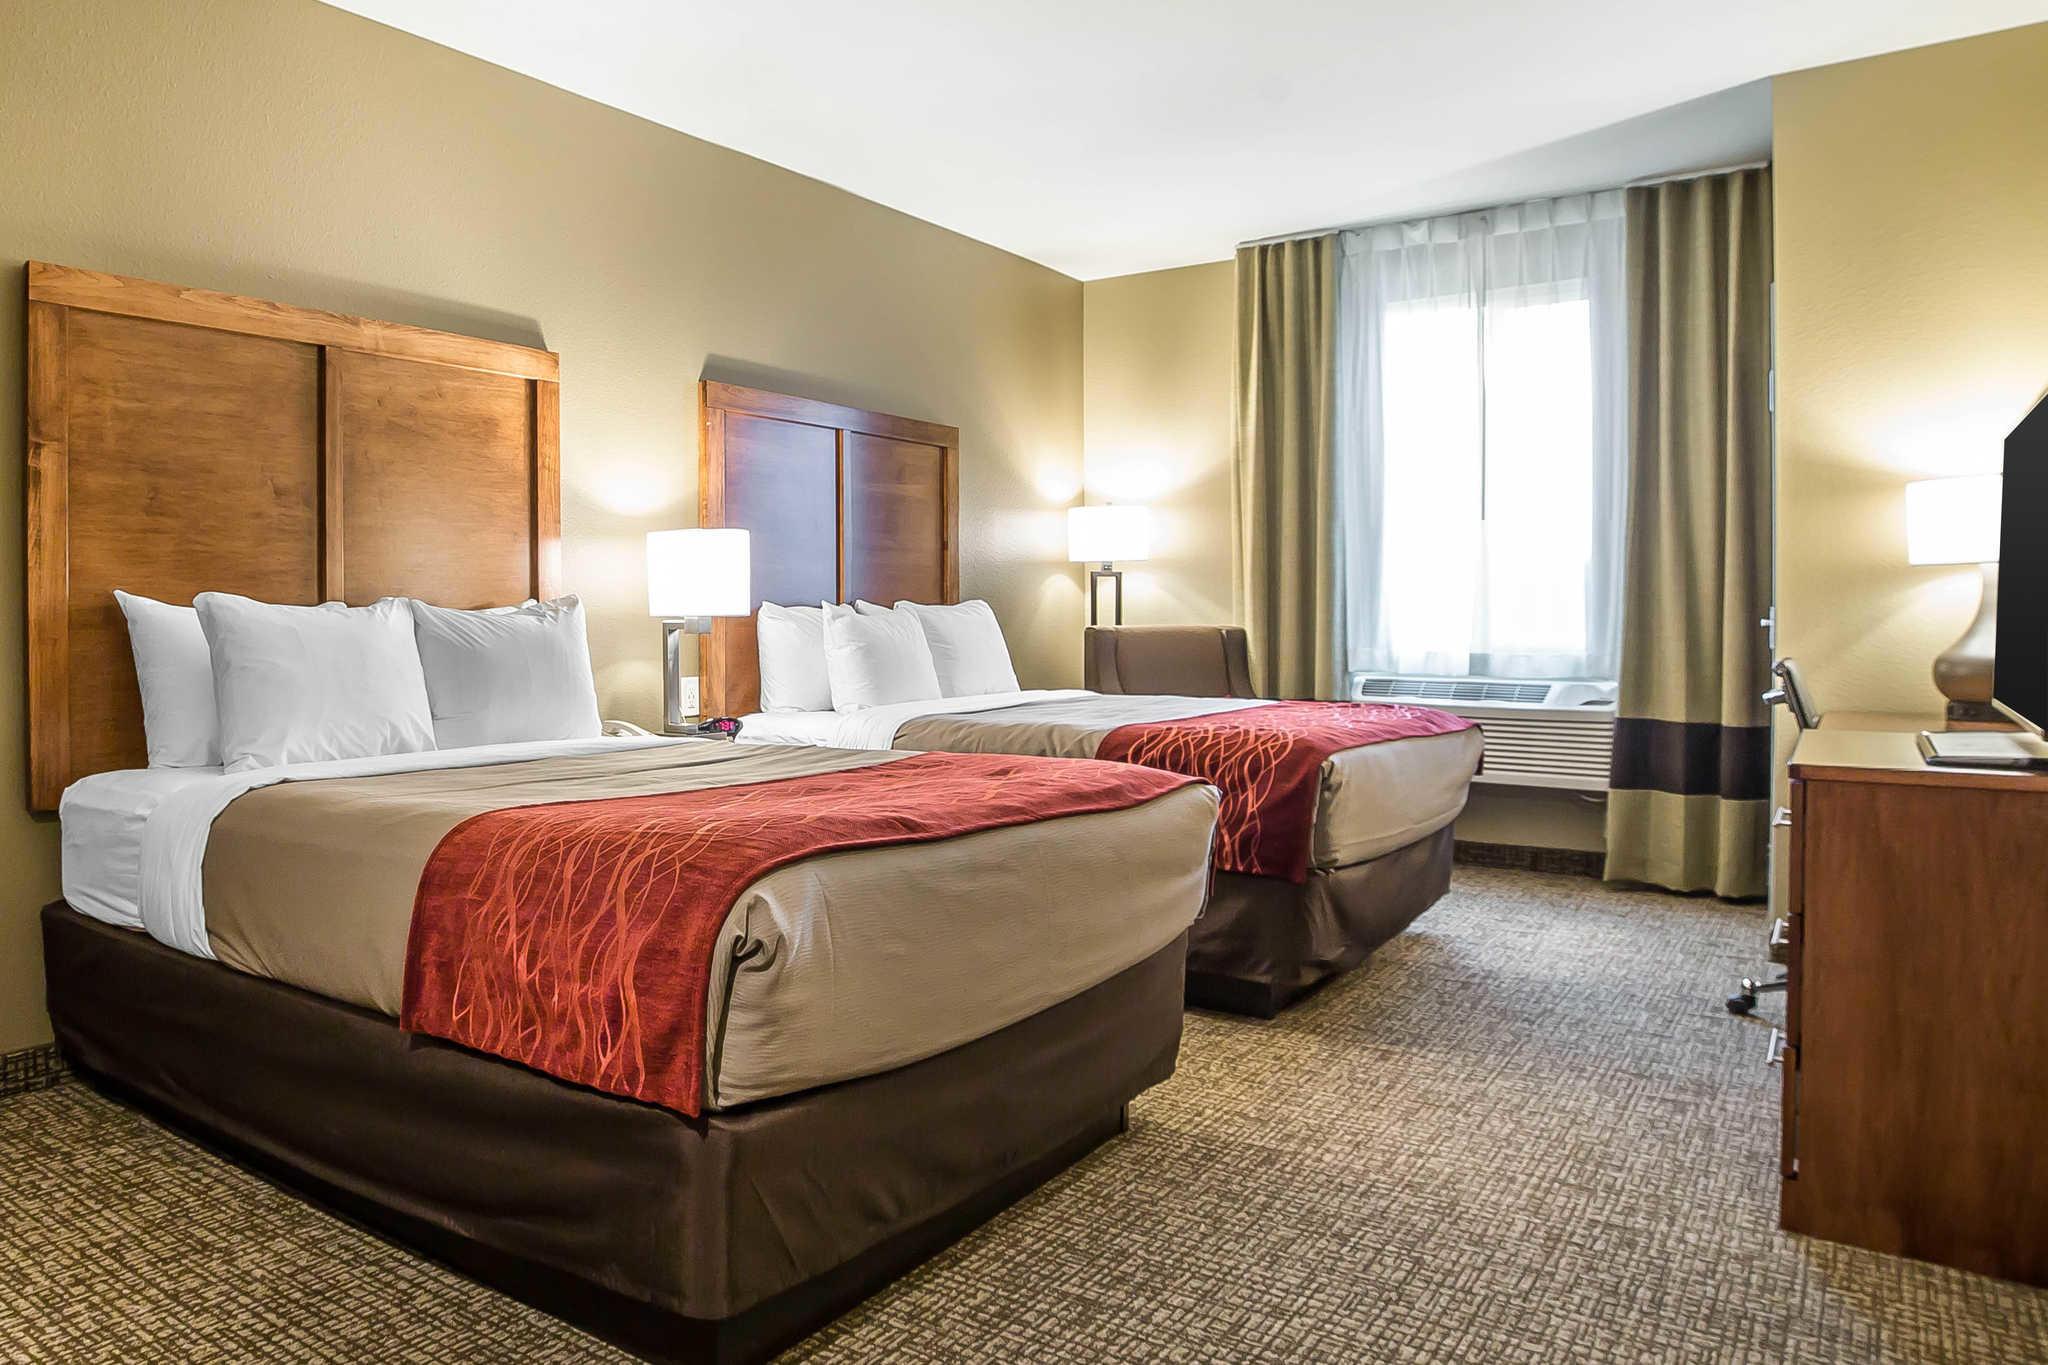 Comfort Inn & Suites Near Mt. Rushmore image 21